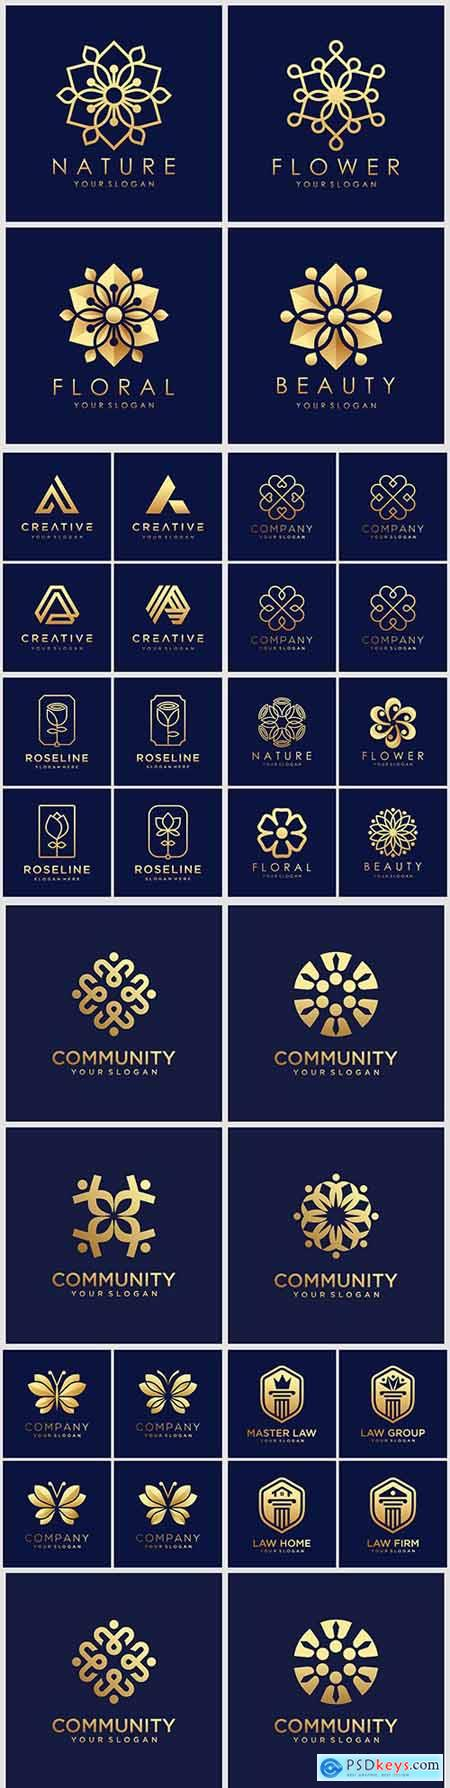 Creative company logos business corporate design 78